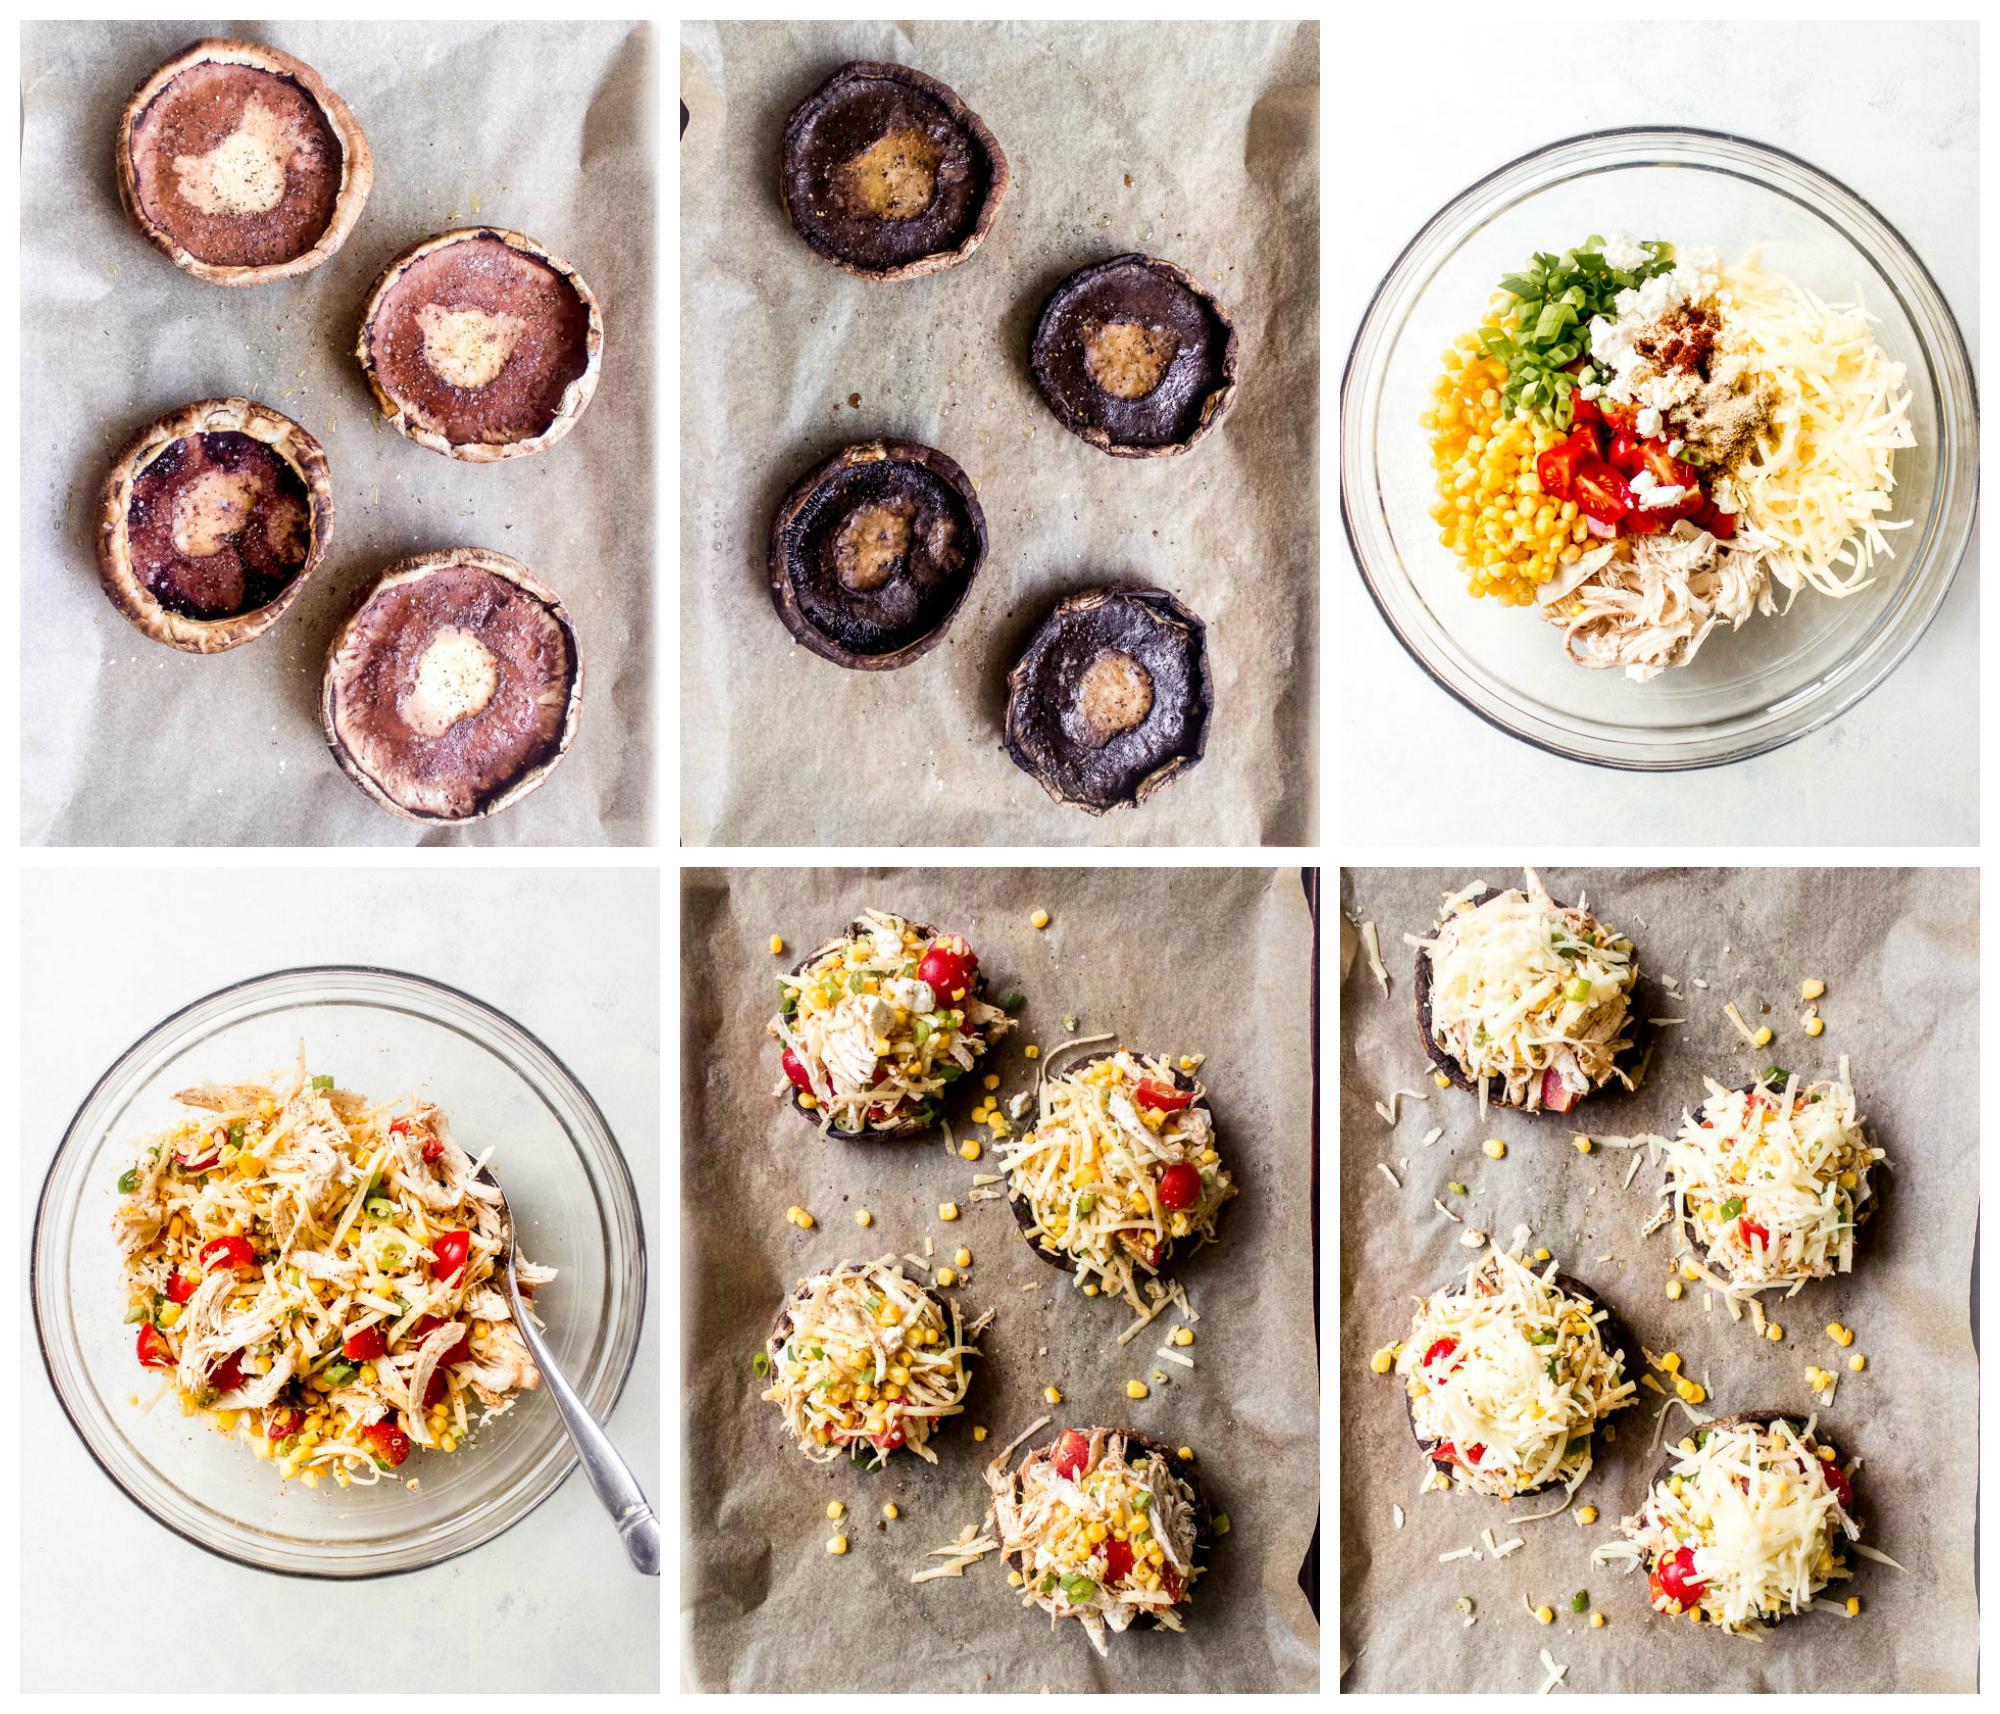 Step by step on how to make stuffed portobello mushrooms